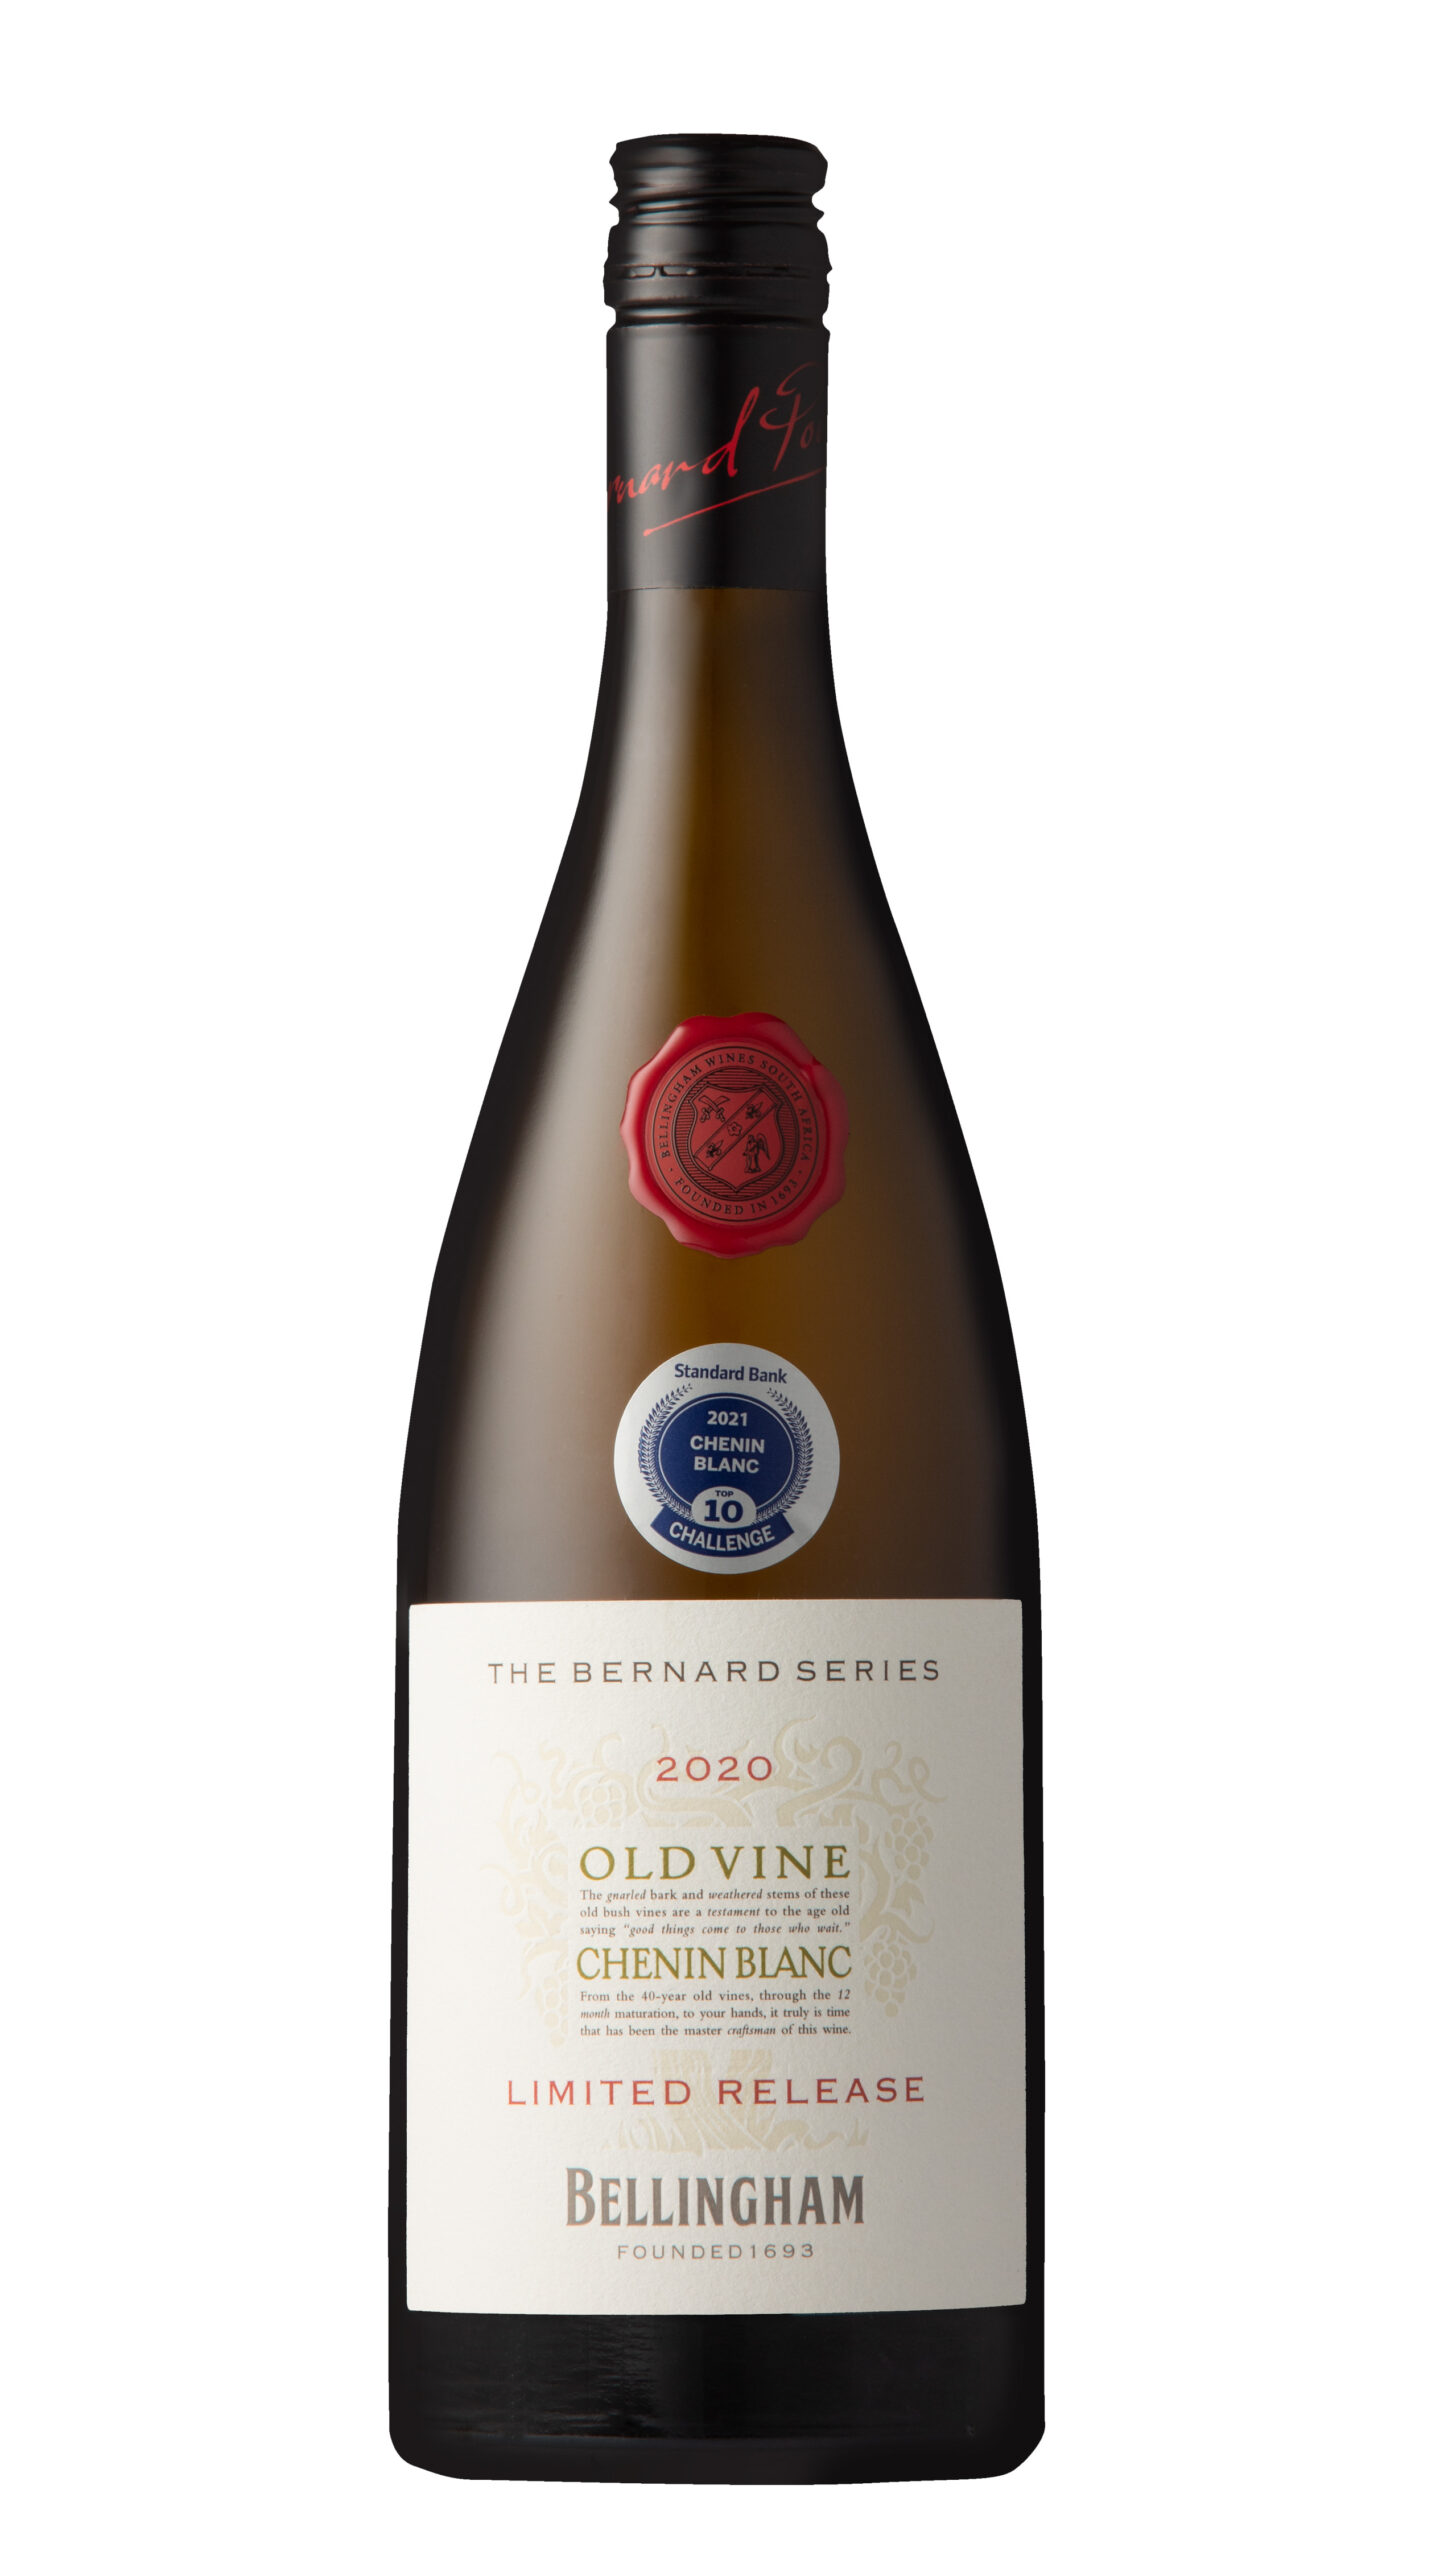 Bernard Series Old Vine Chenin Blanc From Bellingham Emphasis Classic Status With Top 10 Chenin Blanc Spot photo